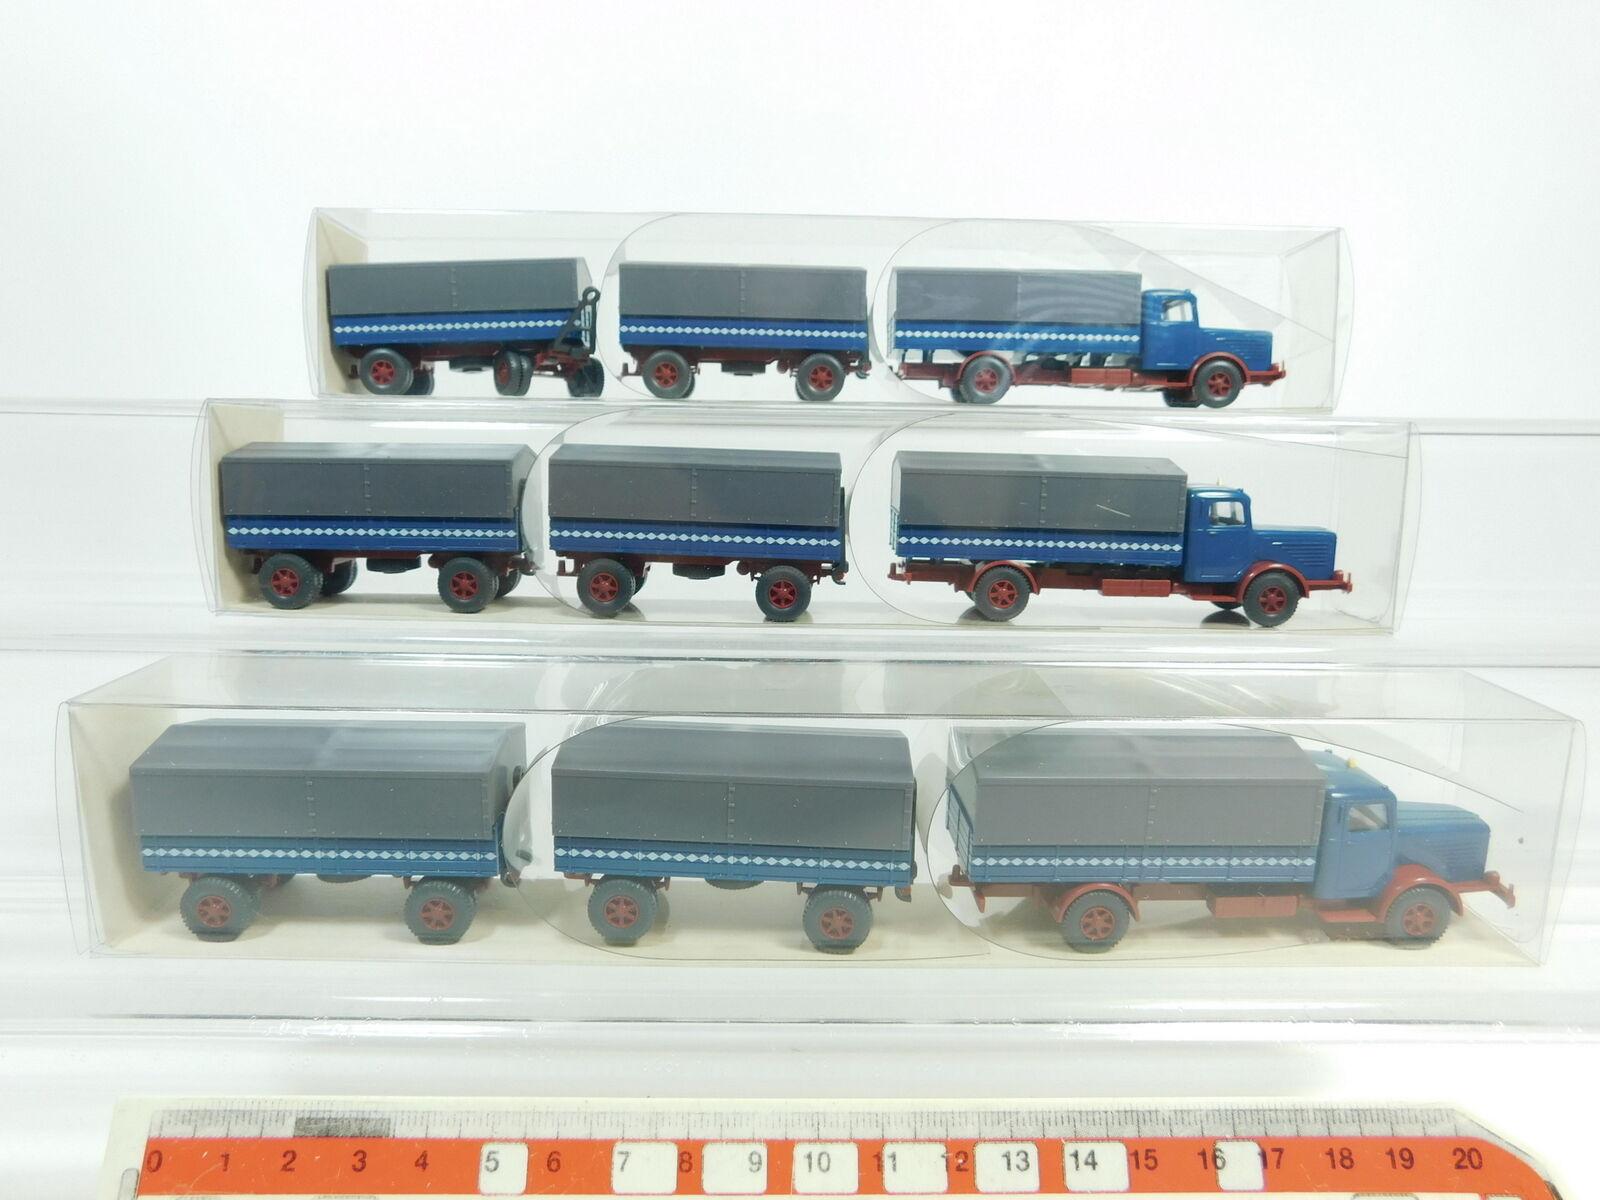 Bd356-0, 5  3x WIKING h0 1 87 29 478 planches-POIDS Camion Büssing 8000, Neuw  neuf dans sa boîte